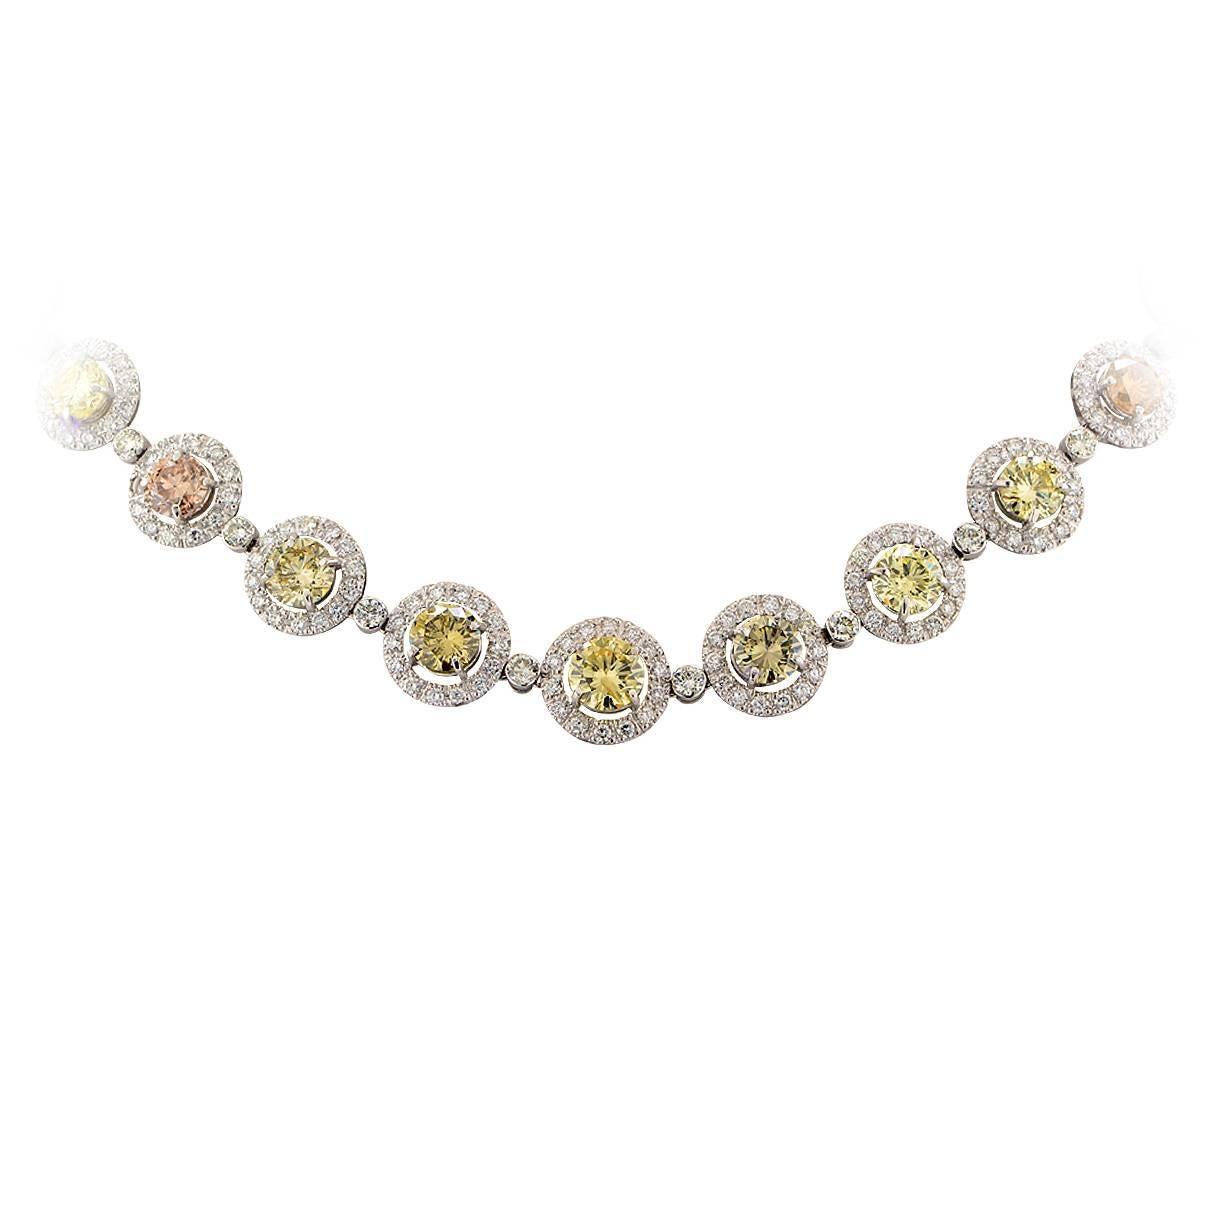 Vivid Diamonds 26.03 Carat GIA Graded Fancy Color Diamond Platinum Necklace